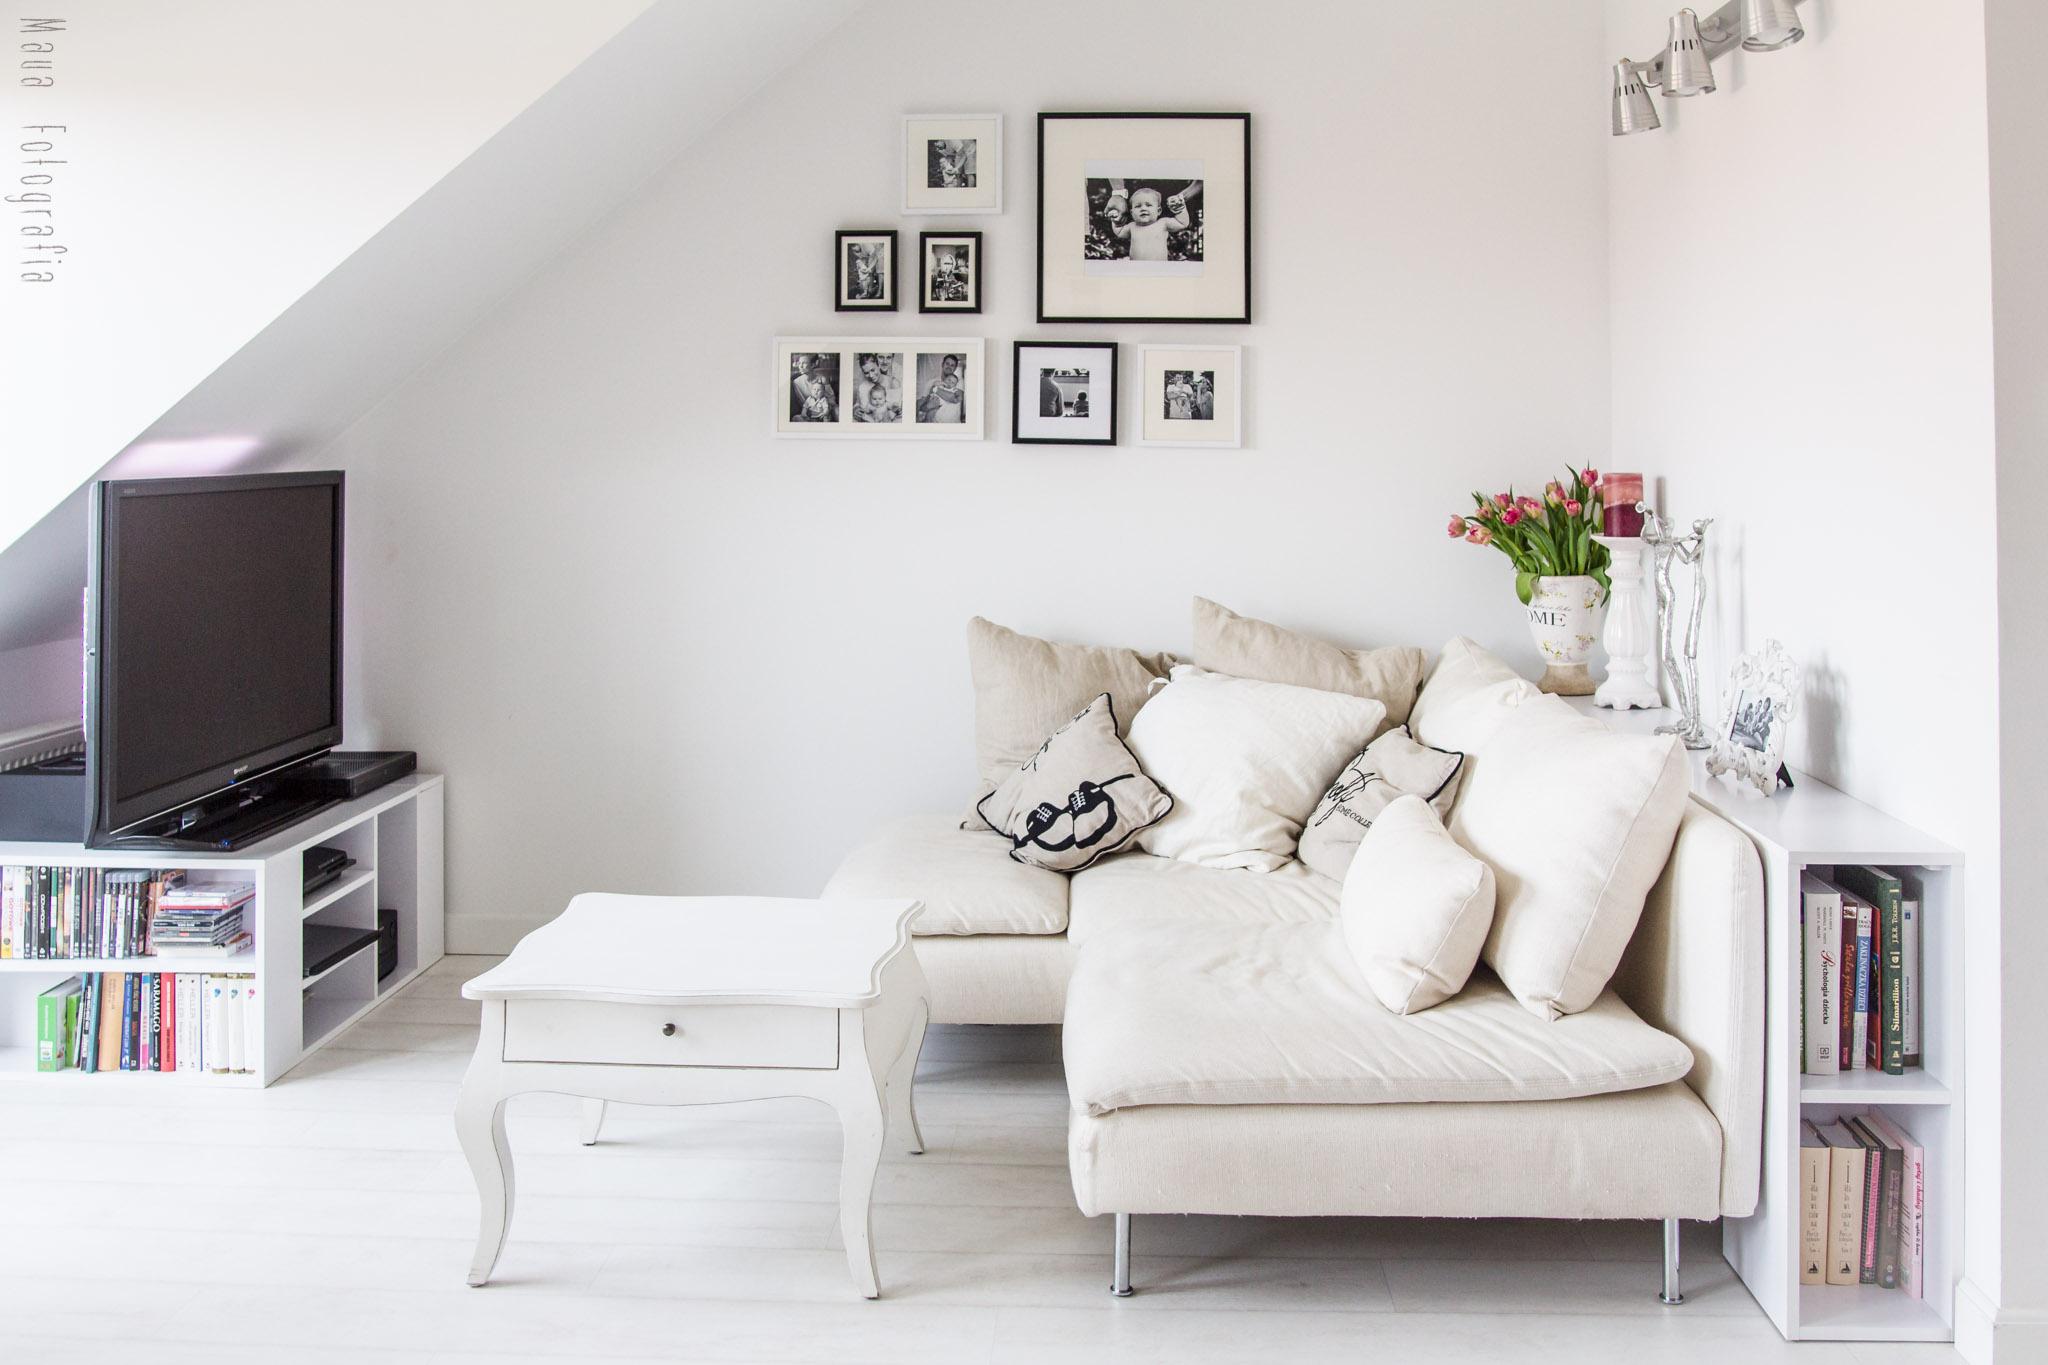 superb living room in home attic design | 30 Attic Living Room Ideas – Adorable Home